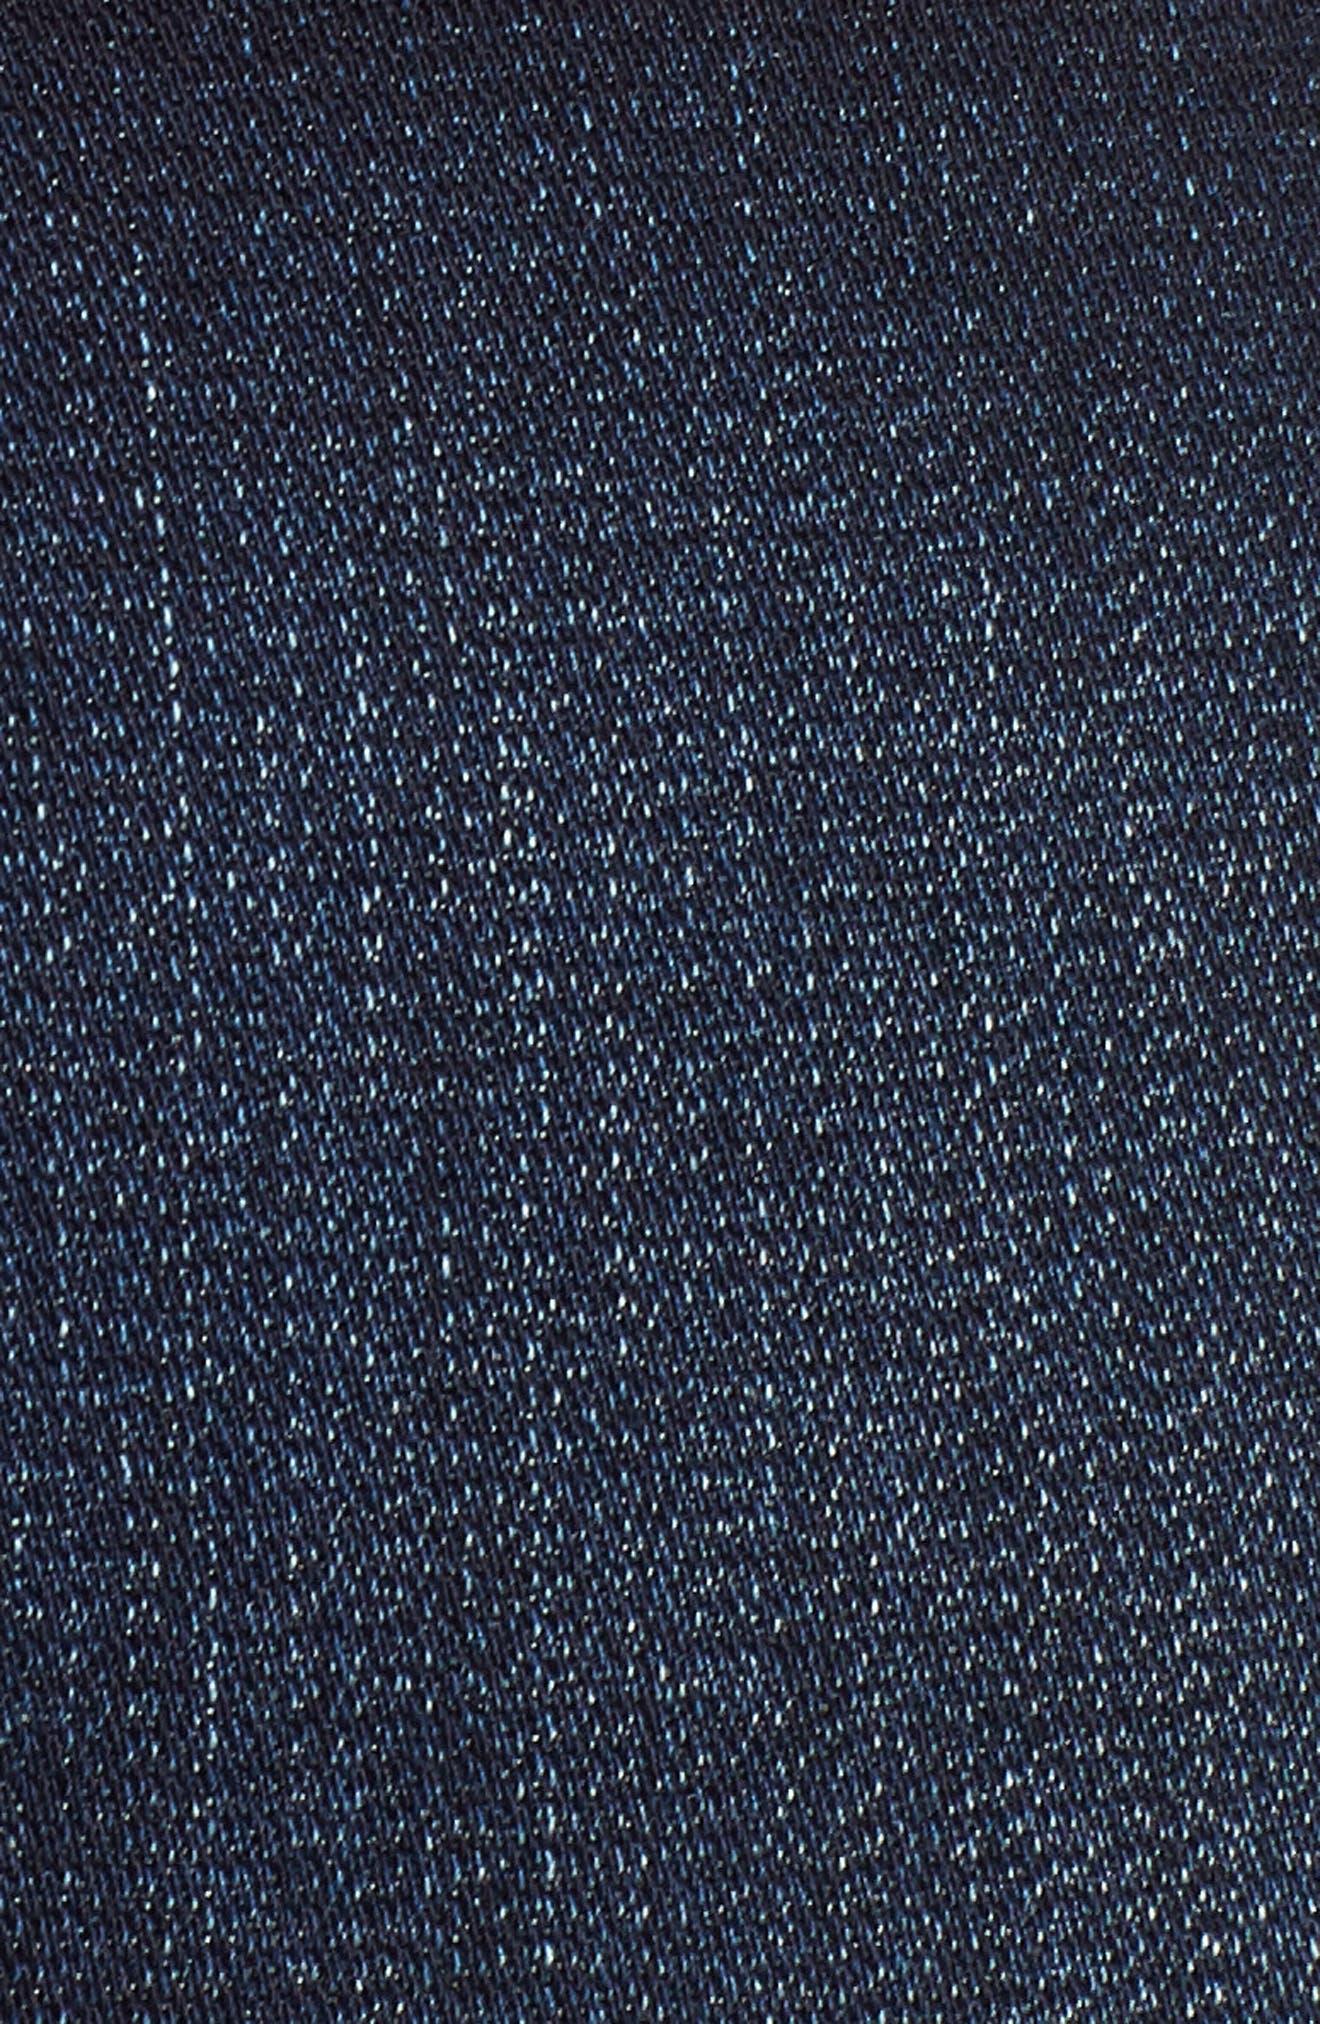 Cuffed Denim Shorts,                             Alternate thumbnail 6, color,                             Dark Wash